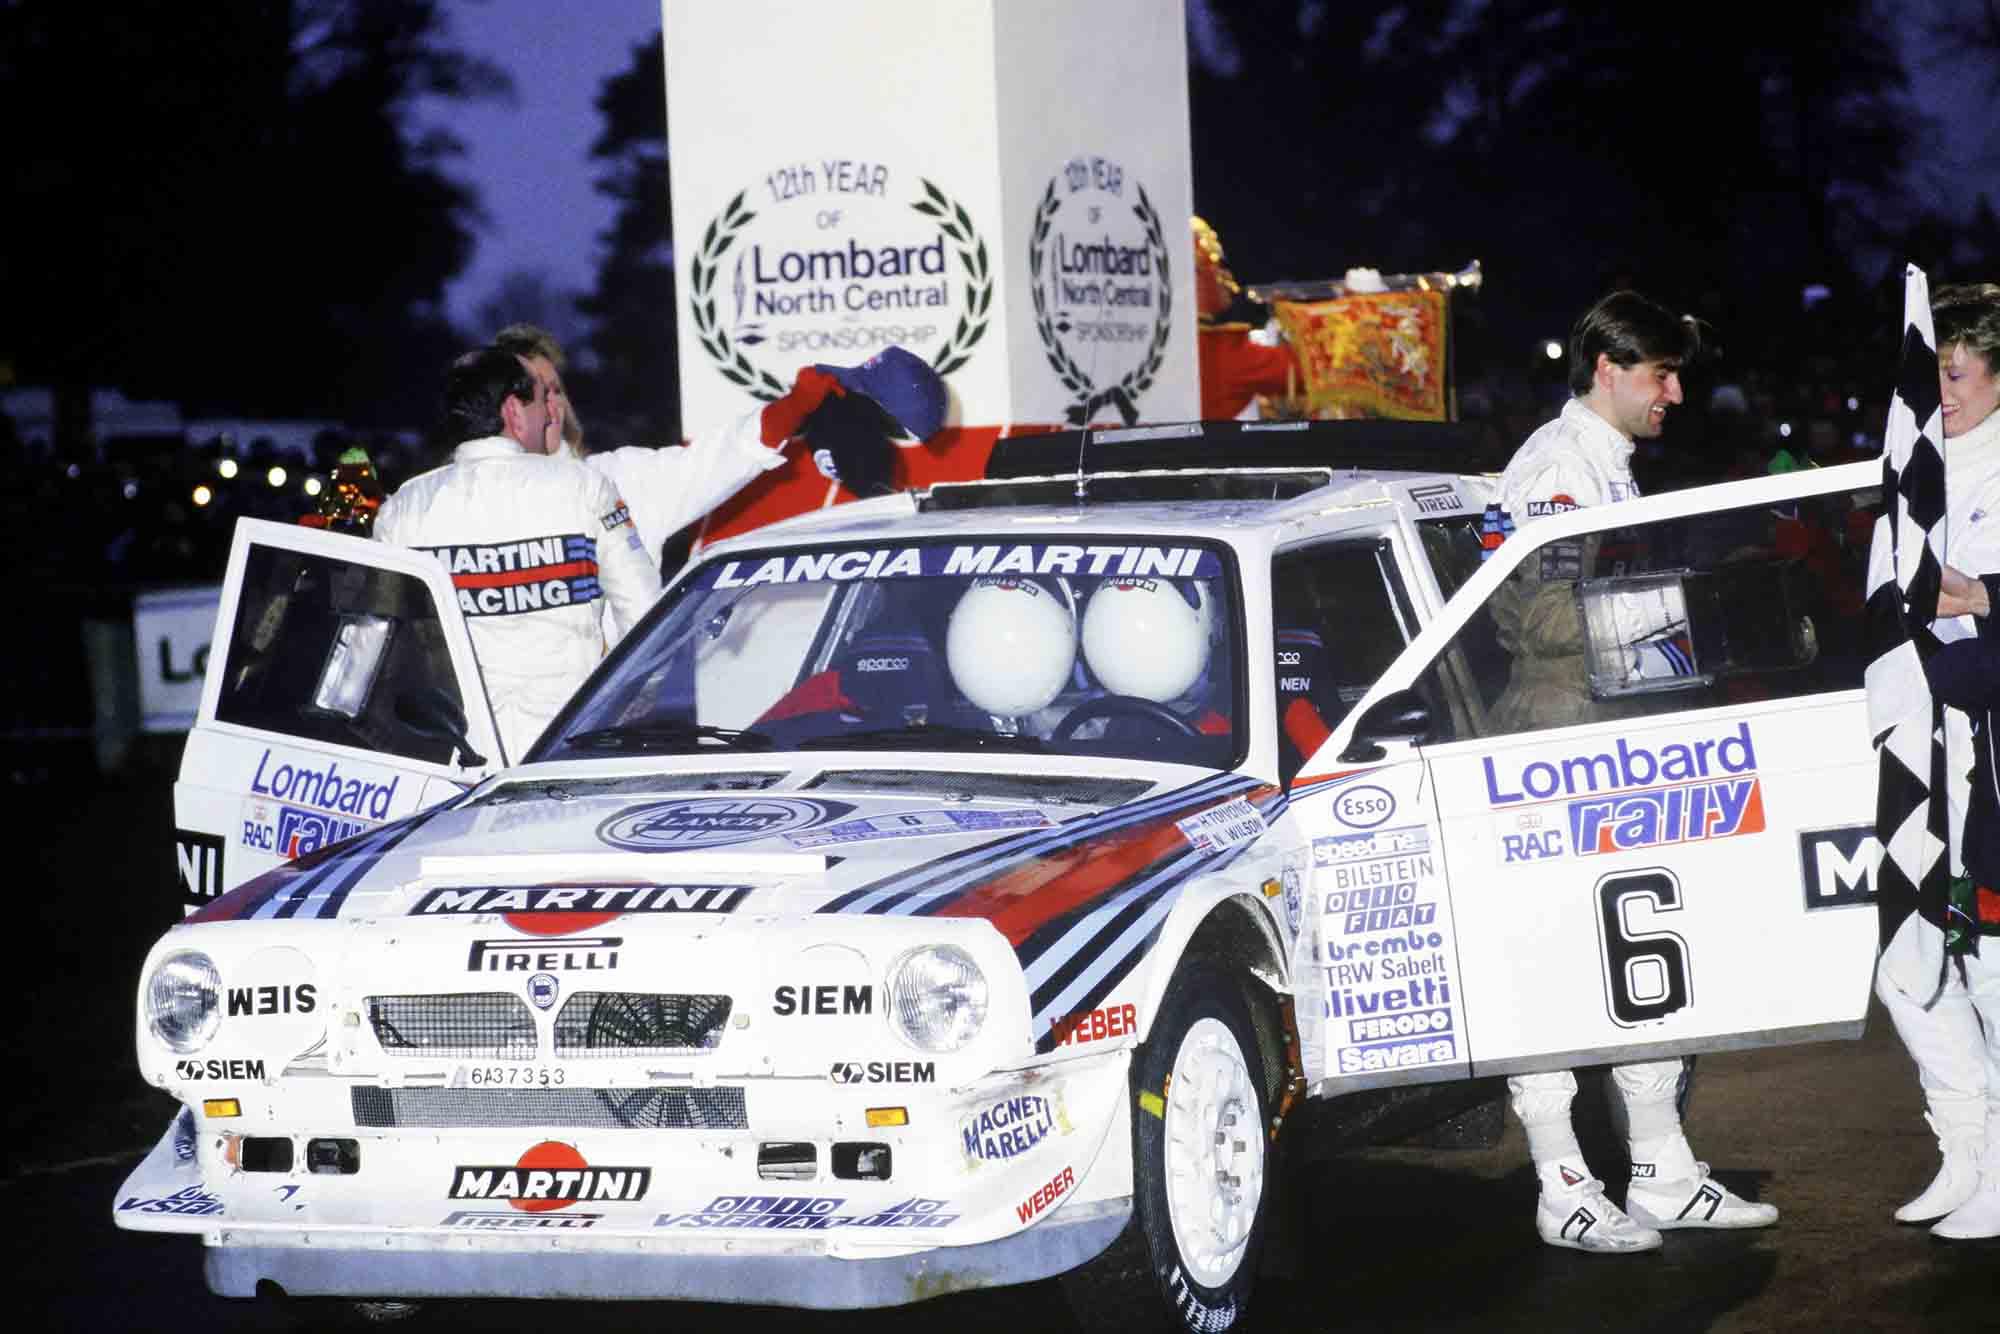 Henri Toivonen wins the 1985 Rally GB in his Lancia